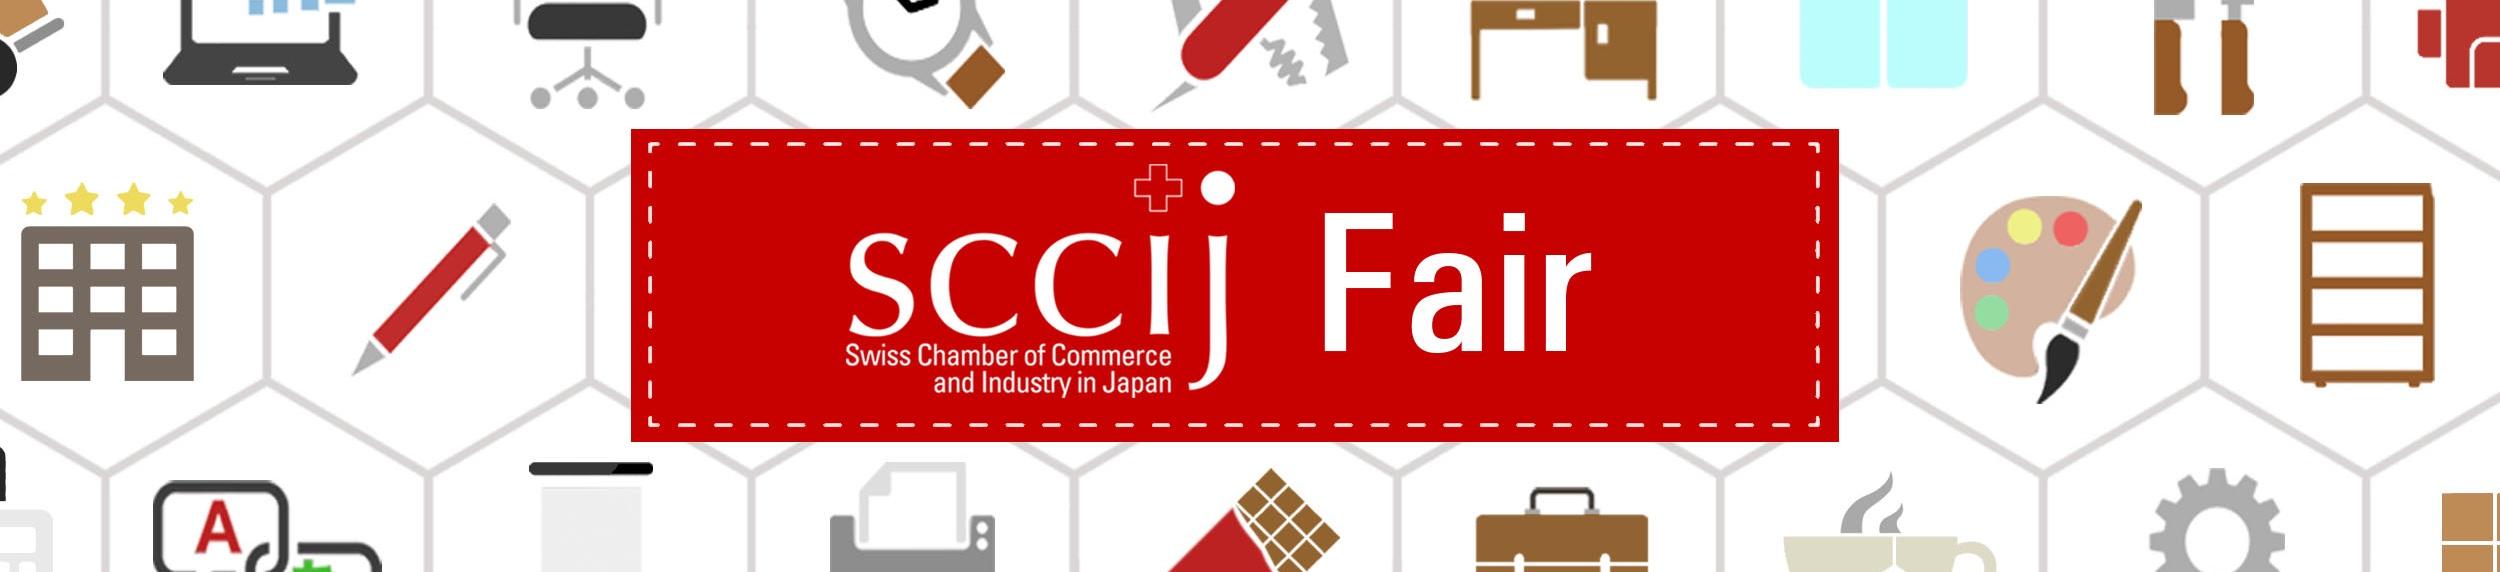 SCCIJ Fair 2021 – SNP Inc.: One Decision Can Shape our Future